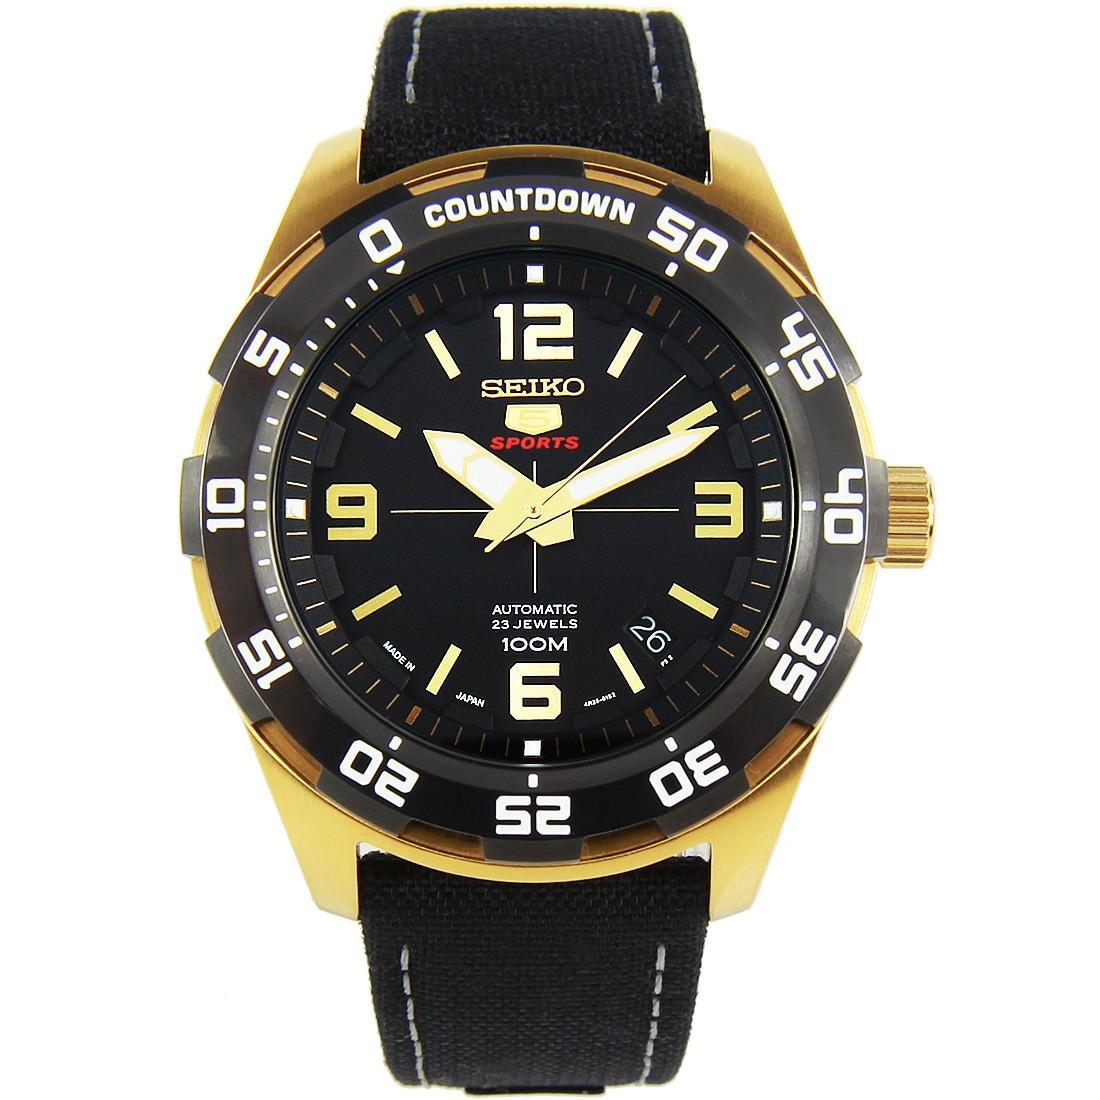 Seiko 5 Sports Automatic Japan Made Mens Black Leather Strap Watch SRPB86 SRPB86J SRPB86J1